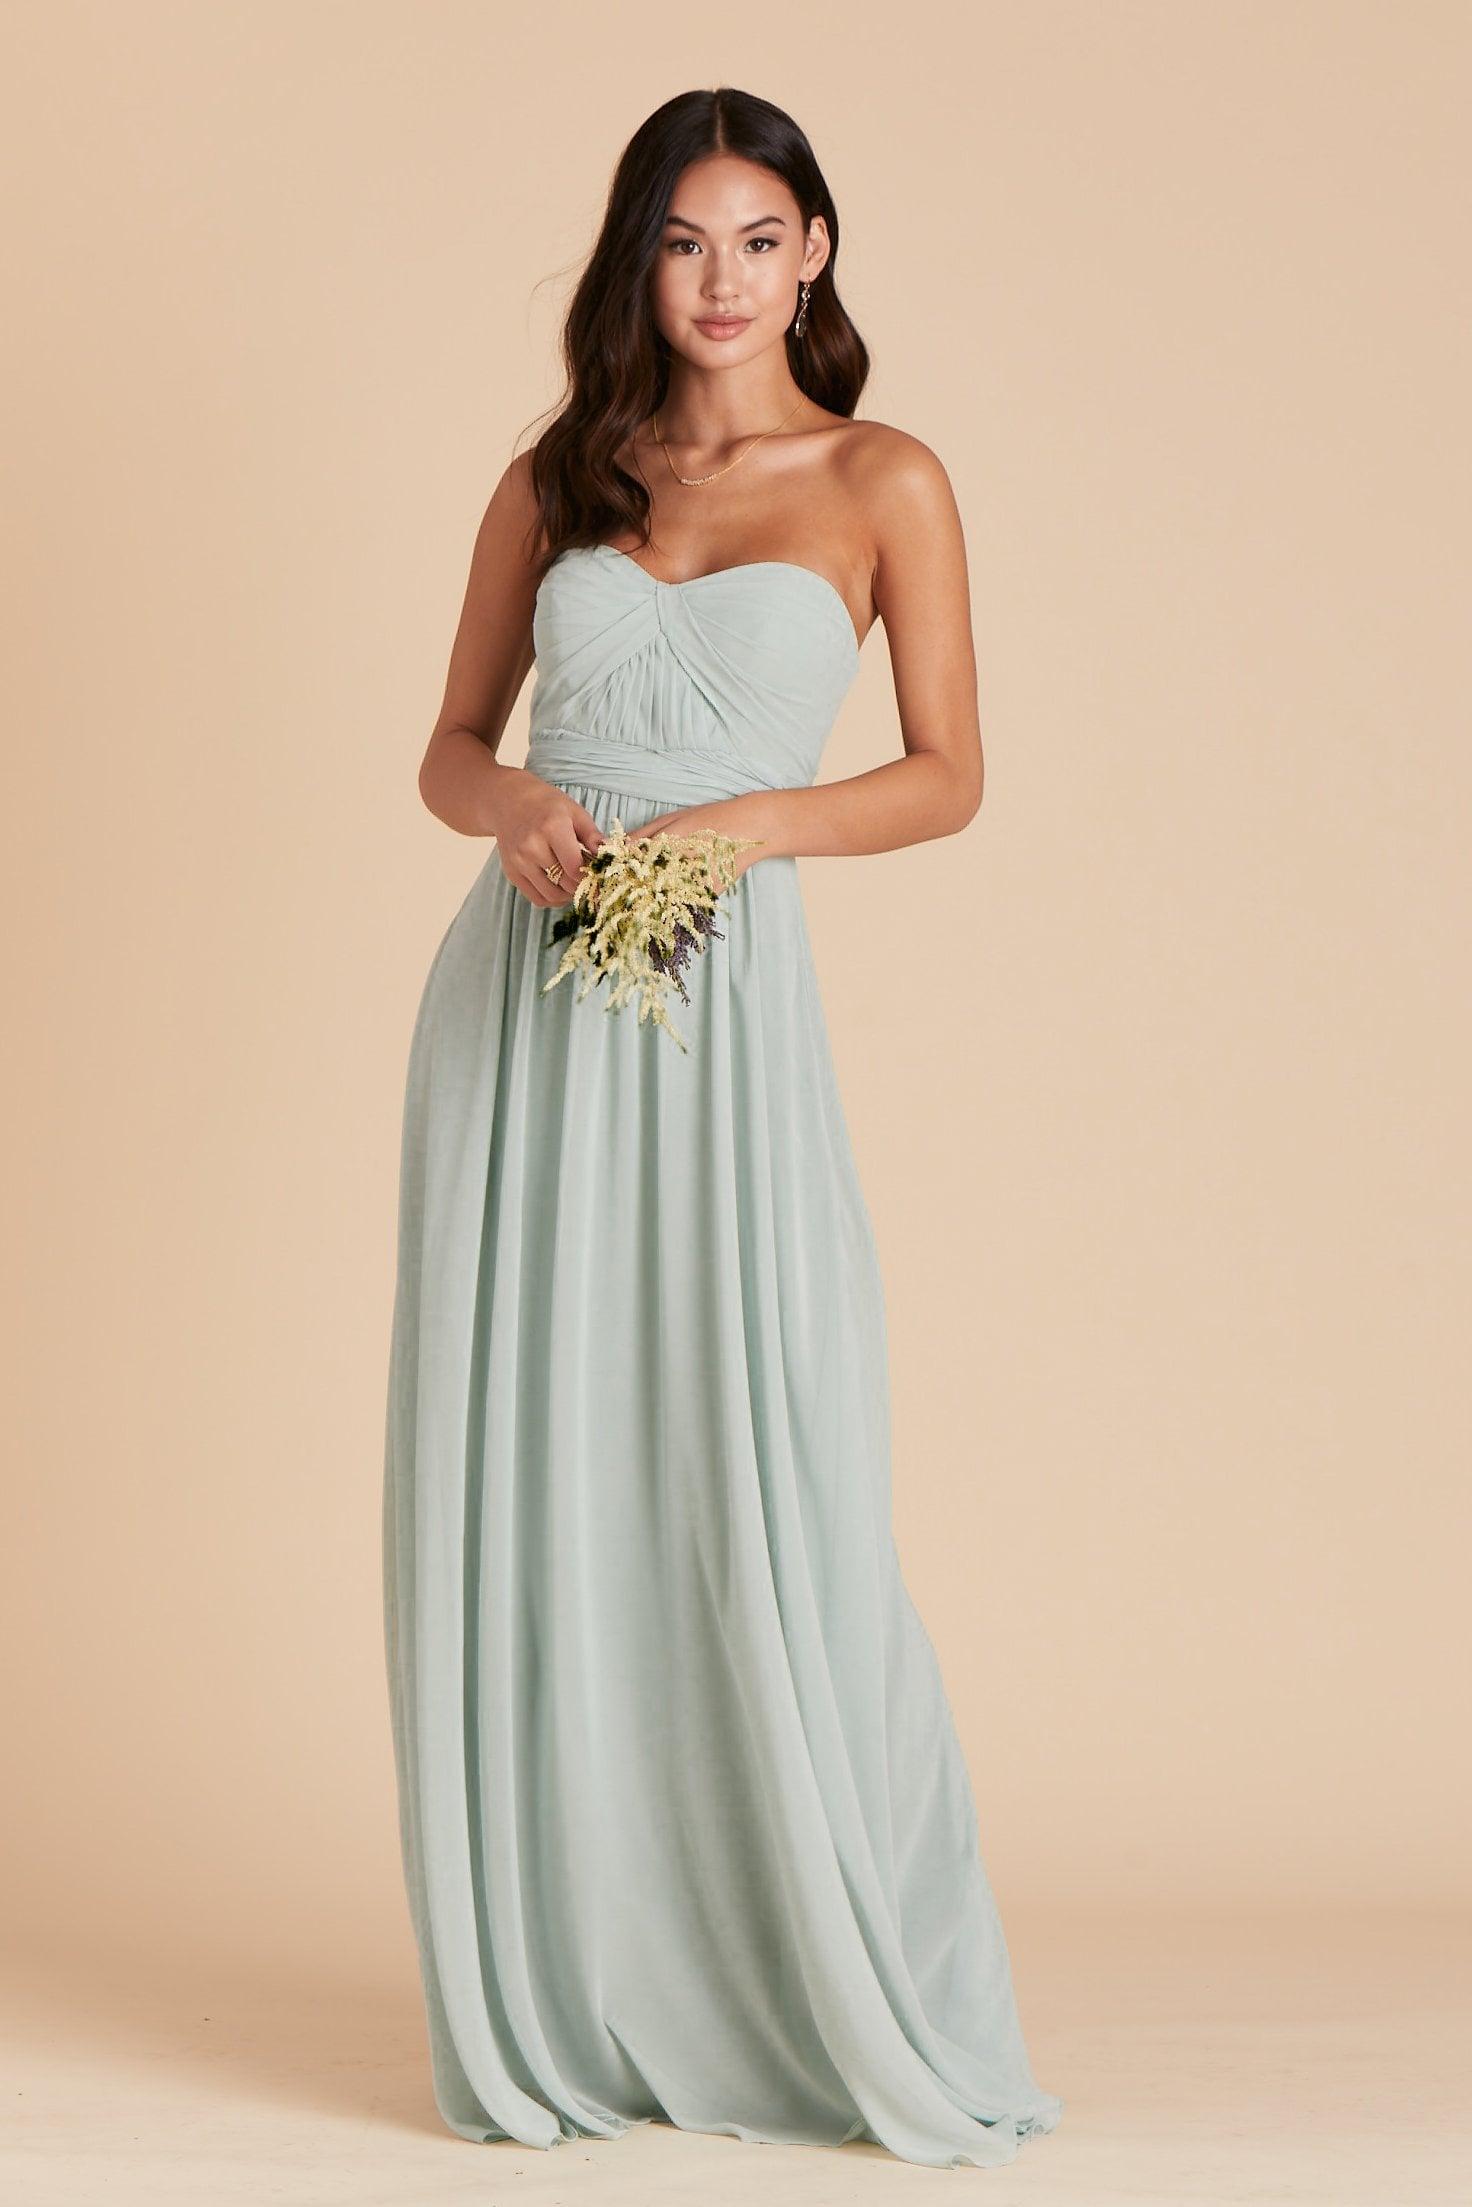 The Best Birdy Grey Bridesmaid Dresses